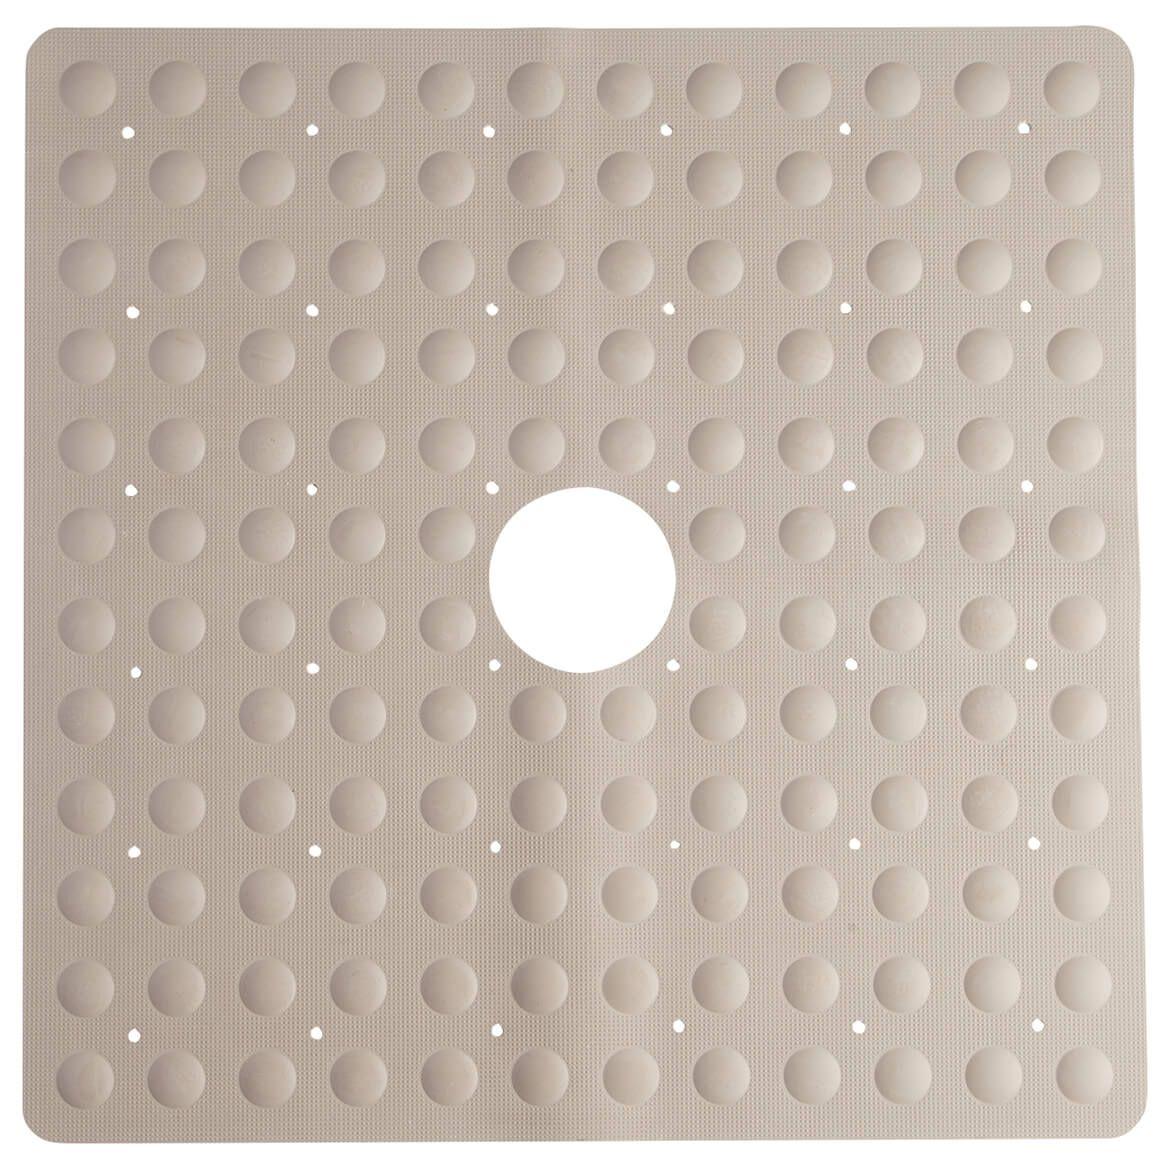 Natural Rubber Safety Shower Mat-361732